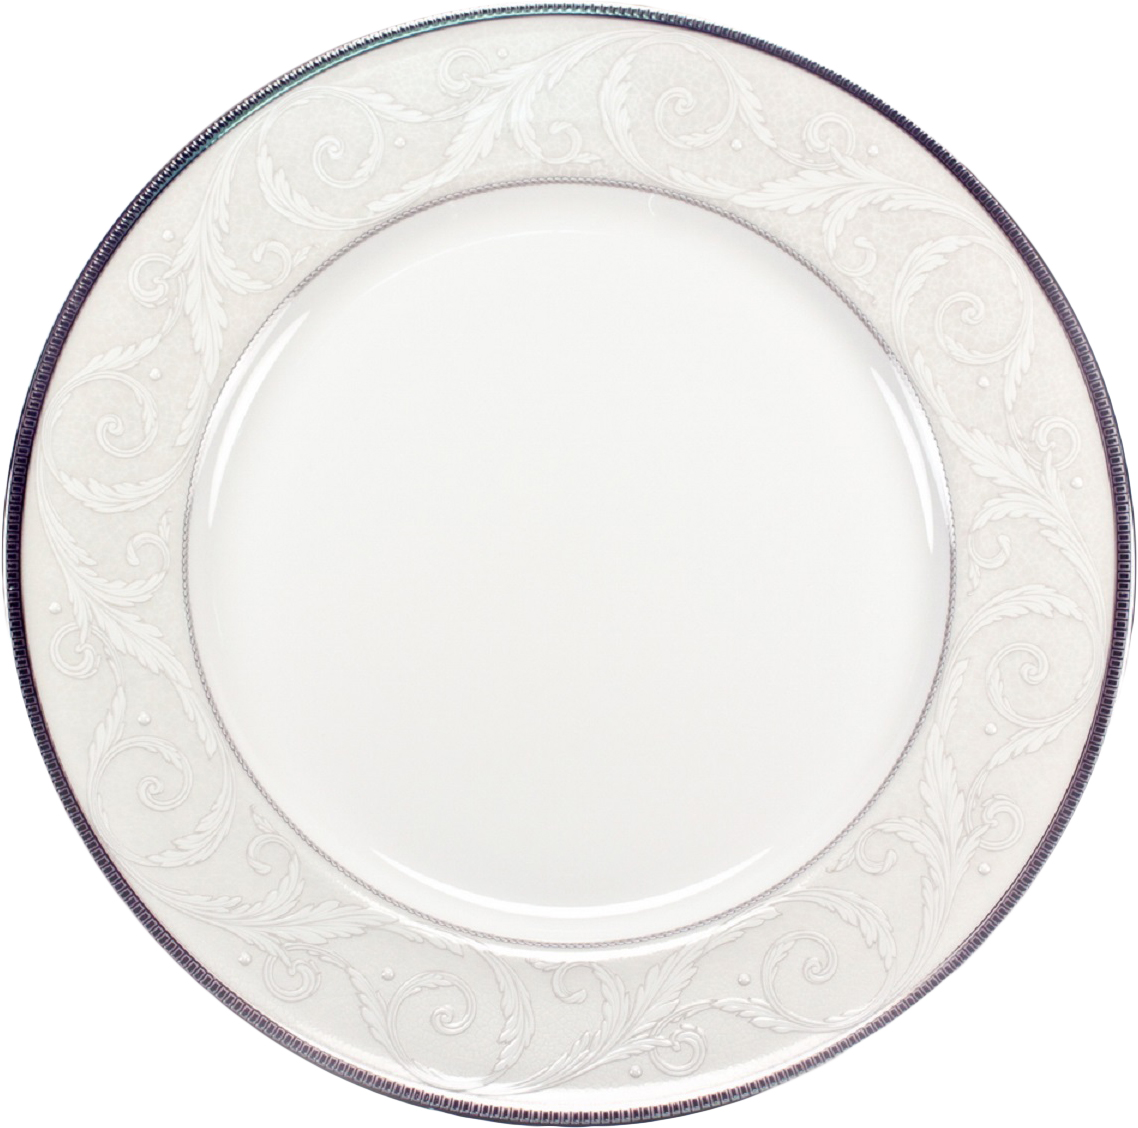 Набор тарелок десертных Narumi Ноктюрн, диаметр 23 см, 6 шт50685-51646